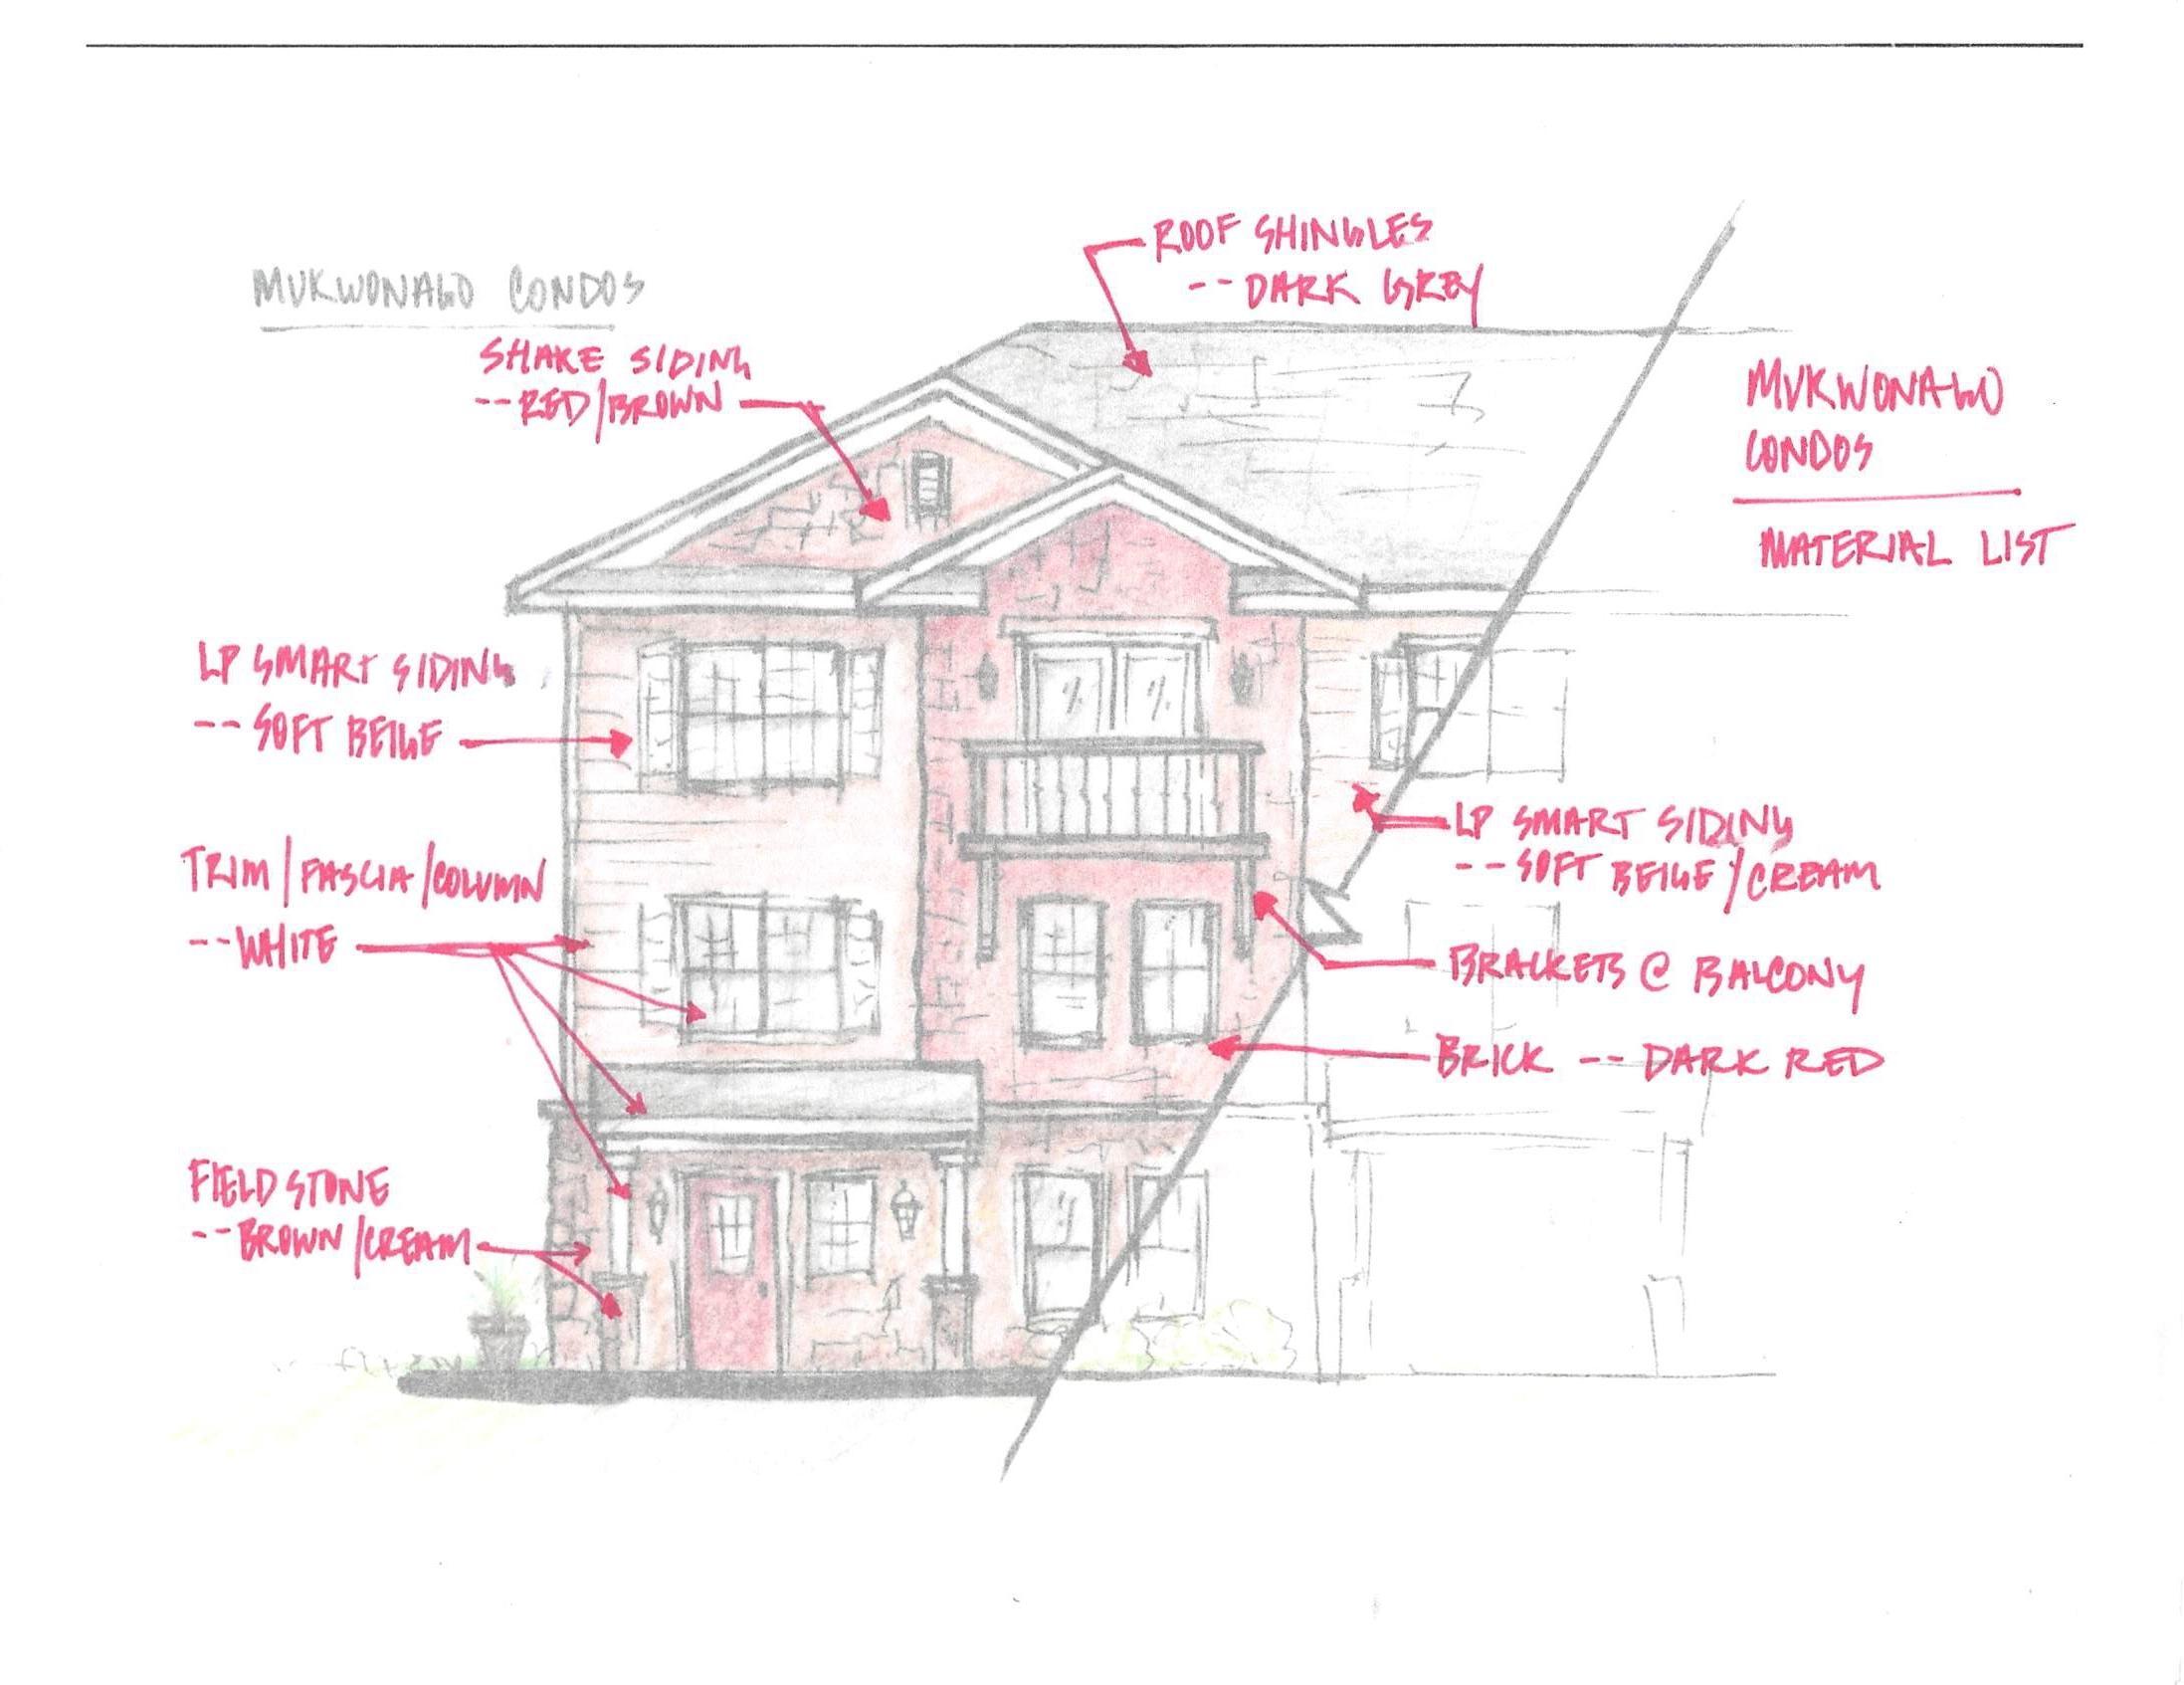 200 Grand Ave, Mukwonago, Wisconsin 53149, 2 Bedrooms Bedrooms, ,2 BathroomsBathrooms,Condominium,For Sale,Grand Ave,1695818